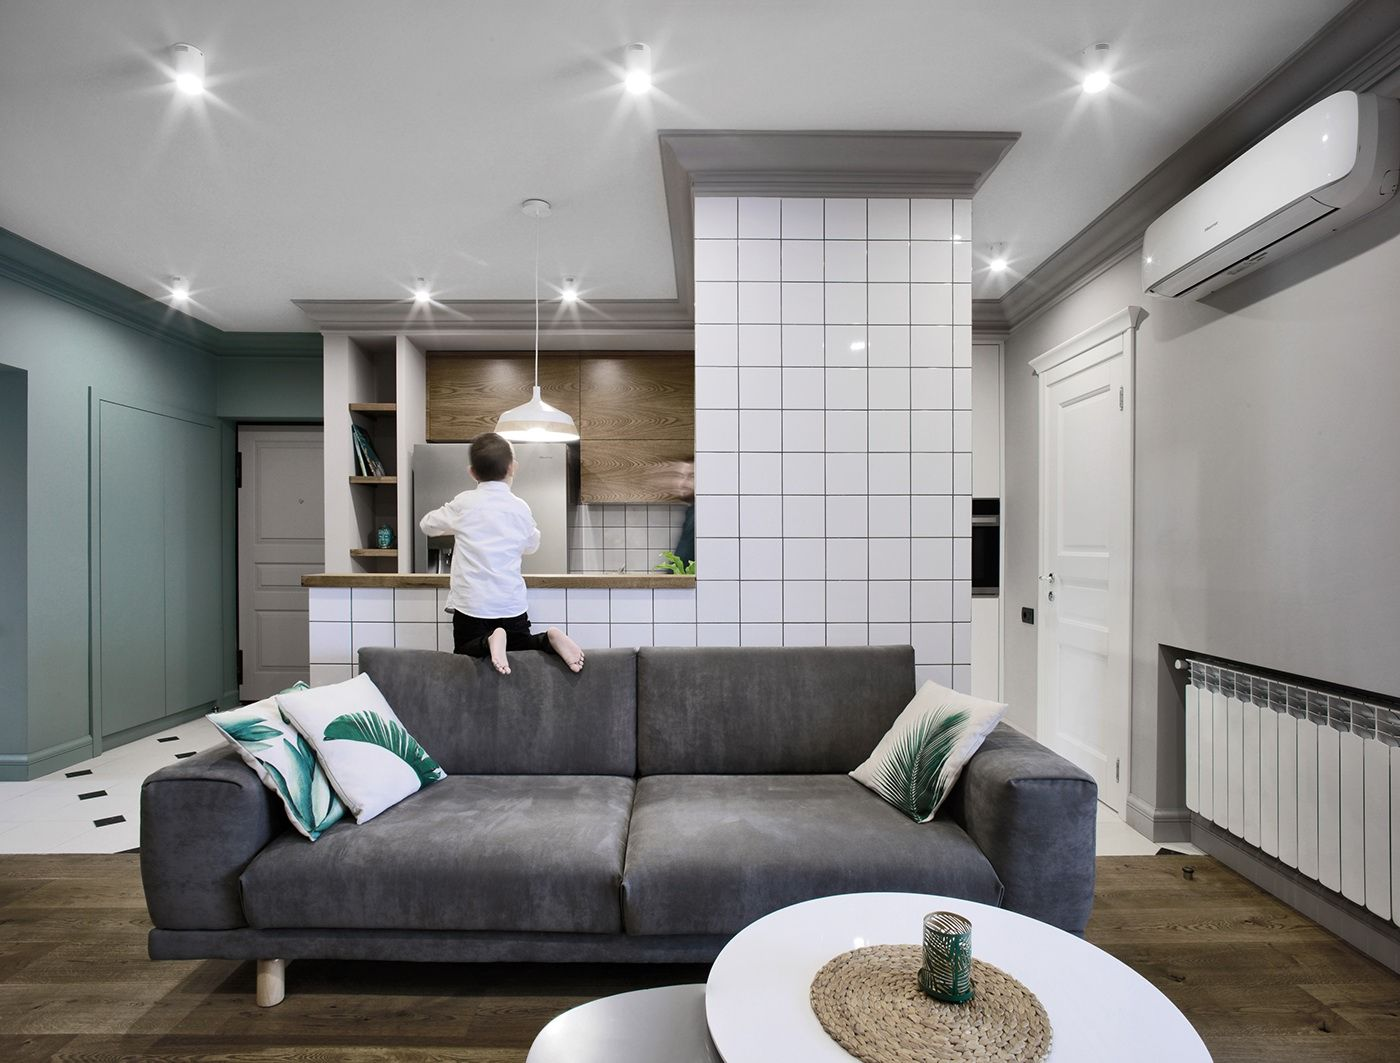 Apartment In Yerevan Futuris Home On Behance Cheap Living Room Decor Home Decor Bedroom Classic Home Decor